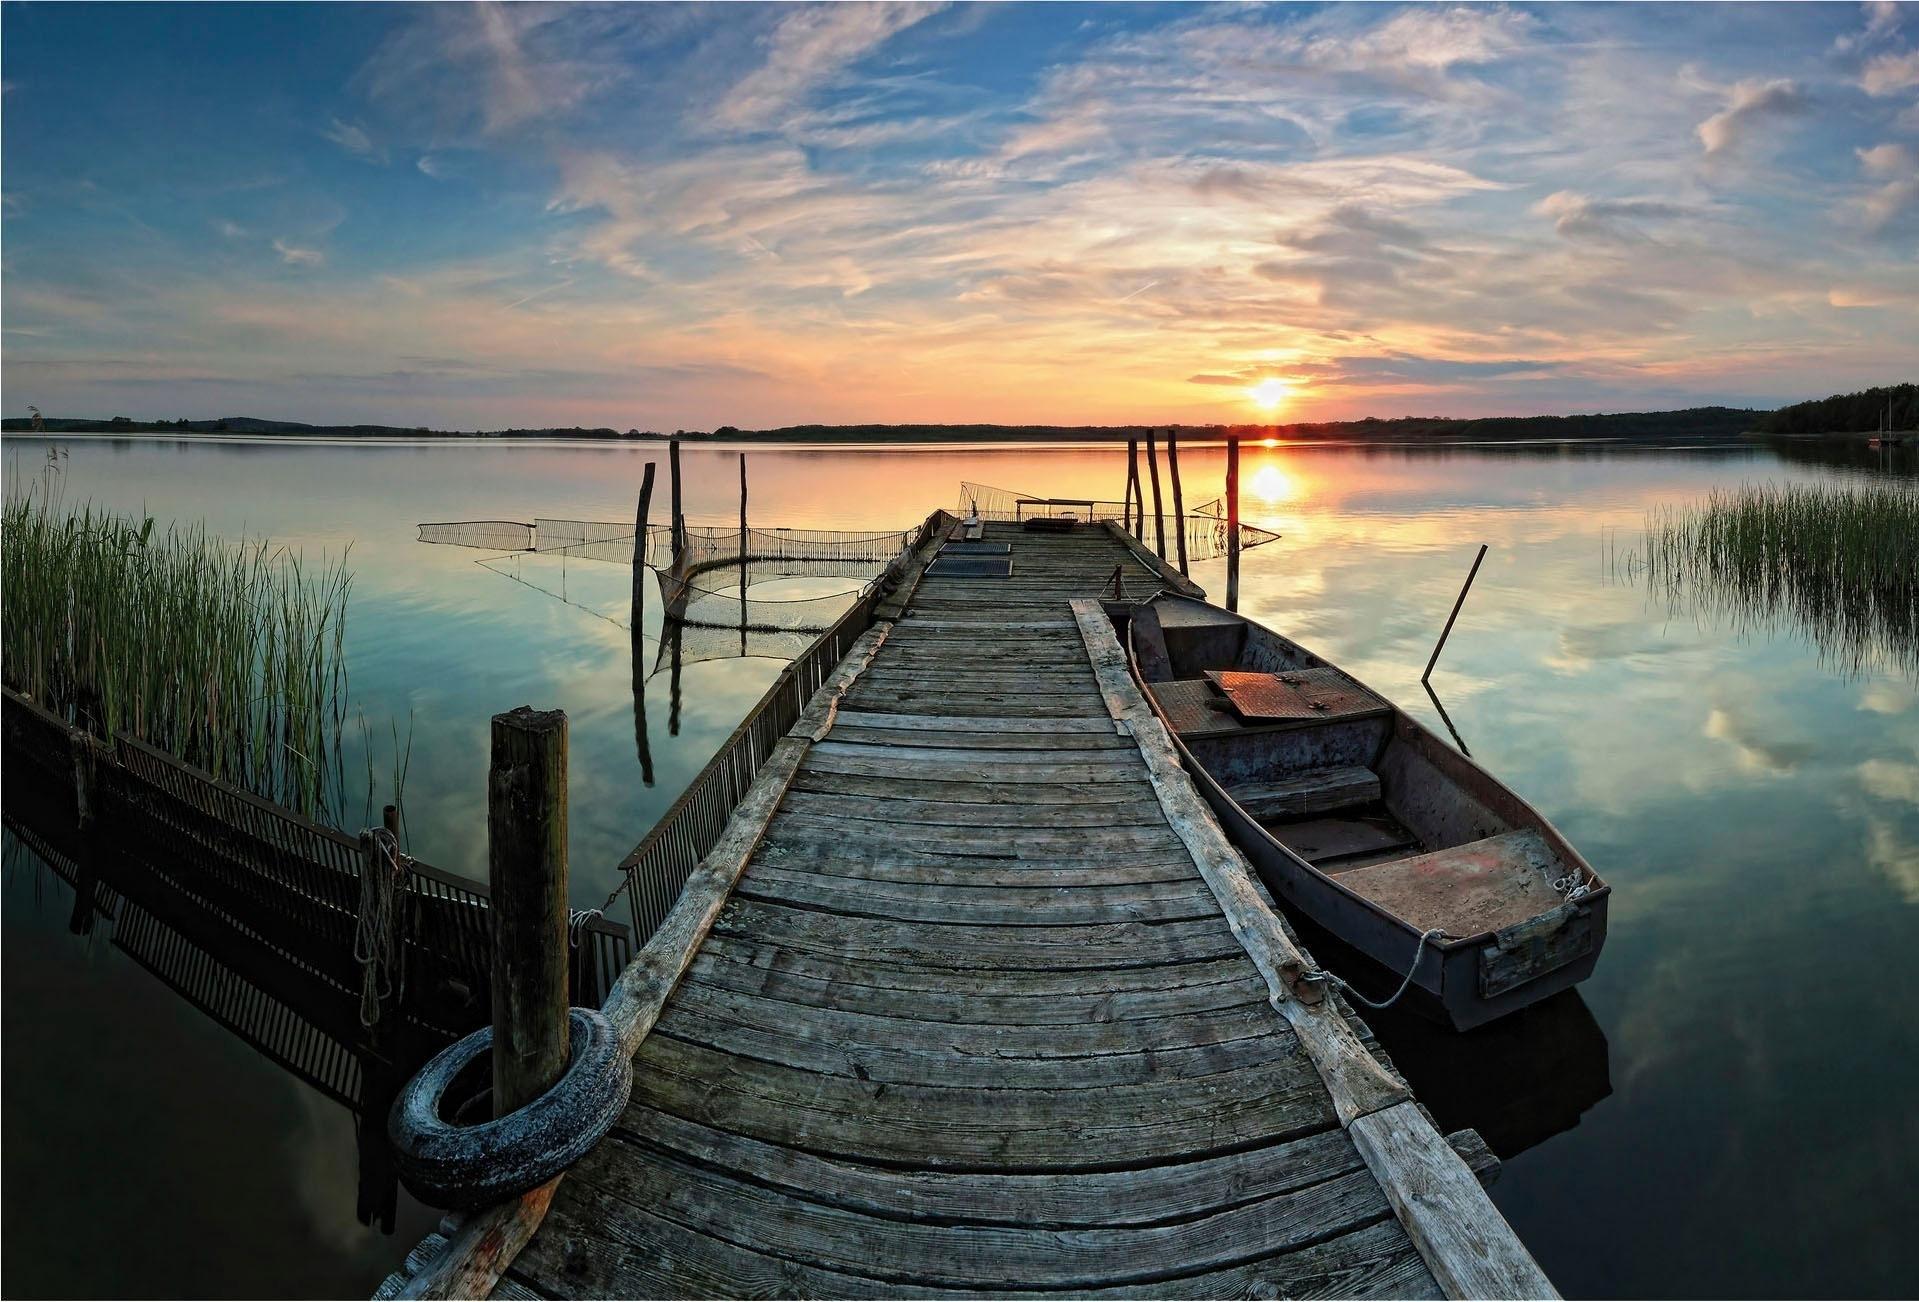 Wall-Art vliesbehang Sunset at the lake nu online kopen bij OTTO